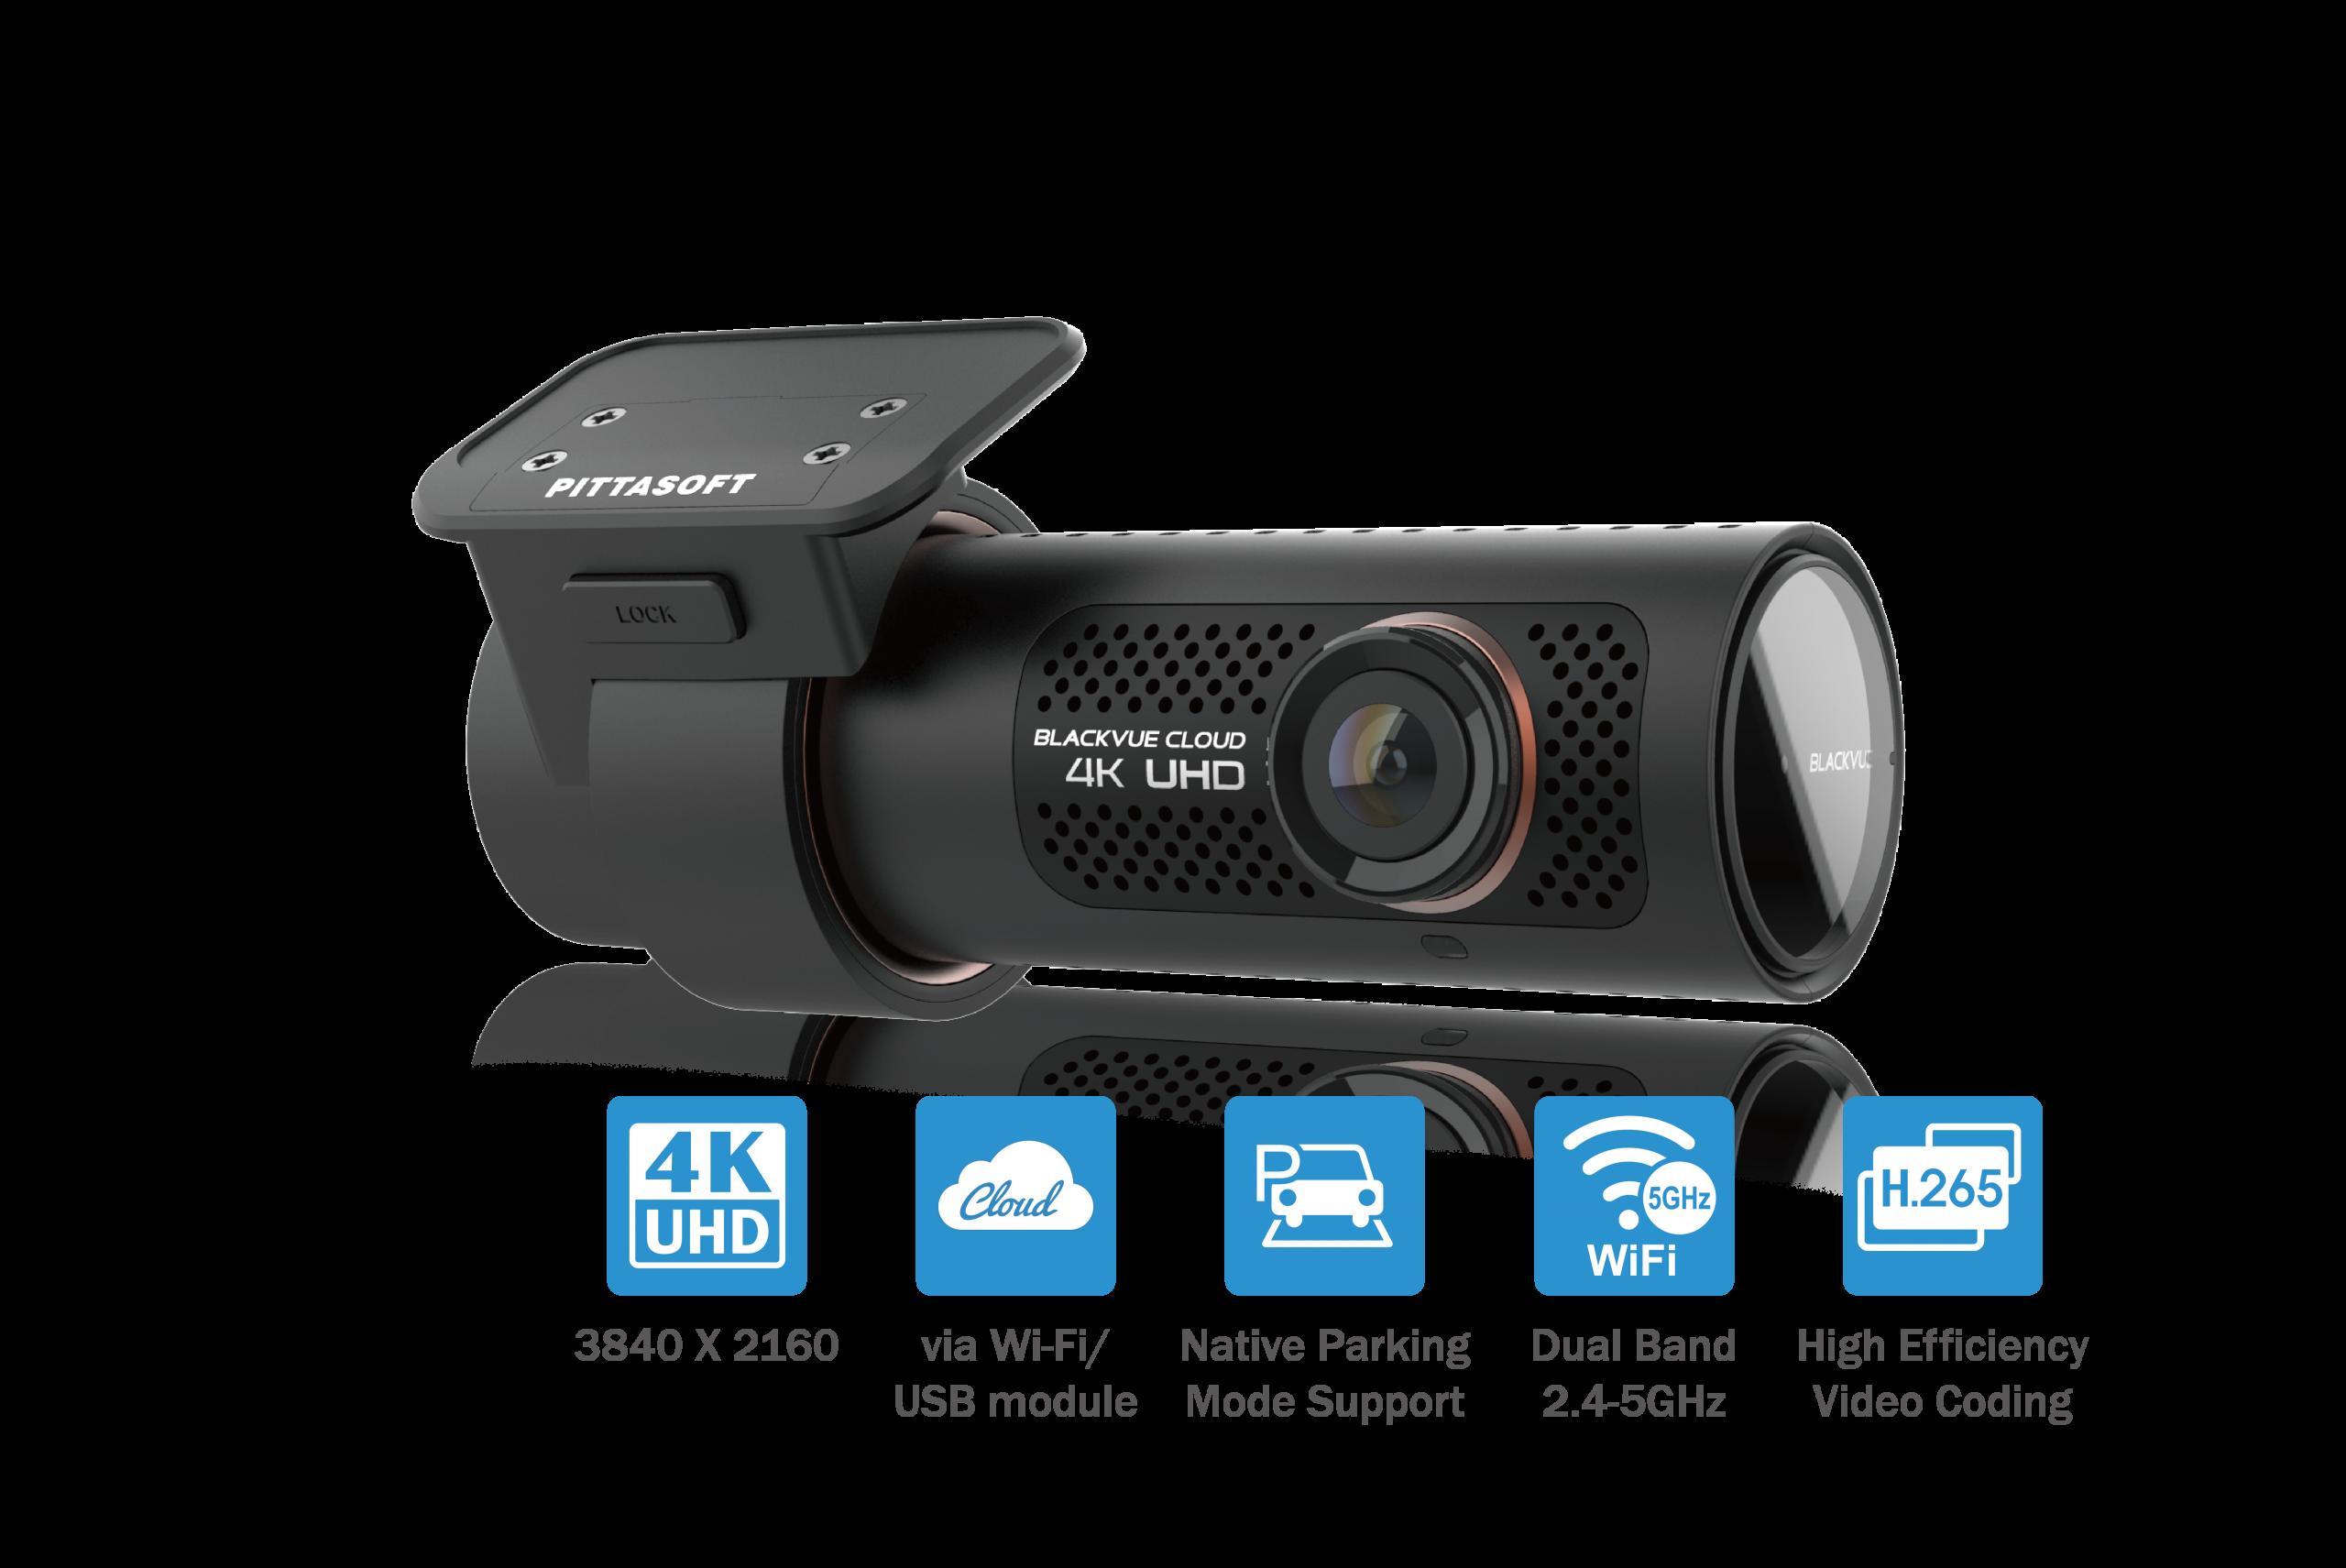 دوربین خودرو بلک ویو BLACKVUE DR900X 4K IR